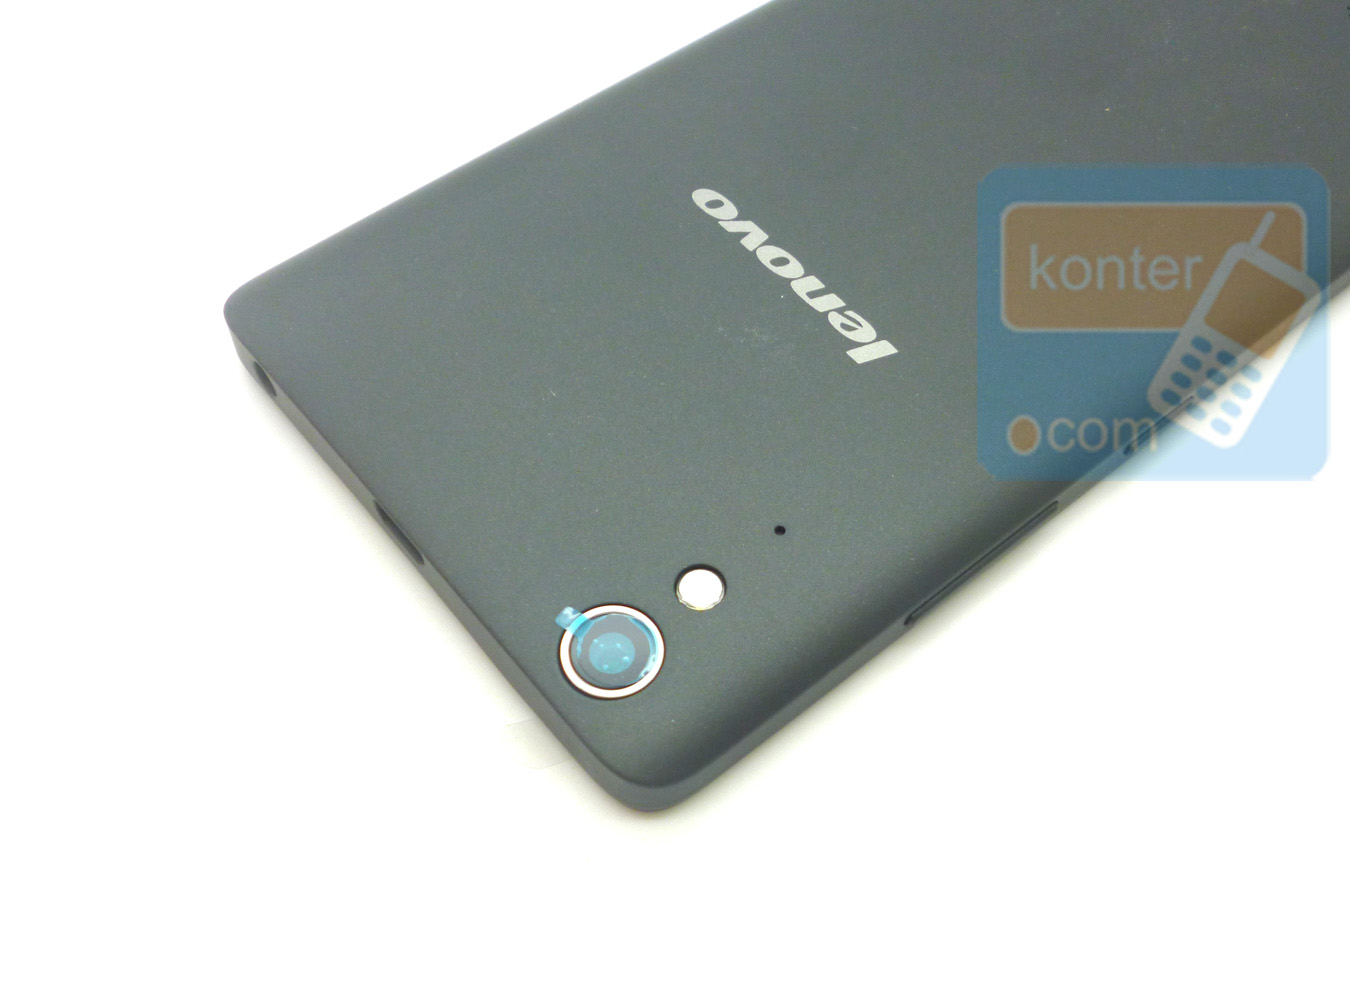 Jual Lenovo A6000 4G LTE 64Bit